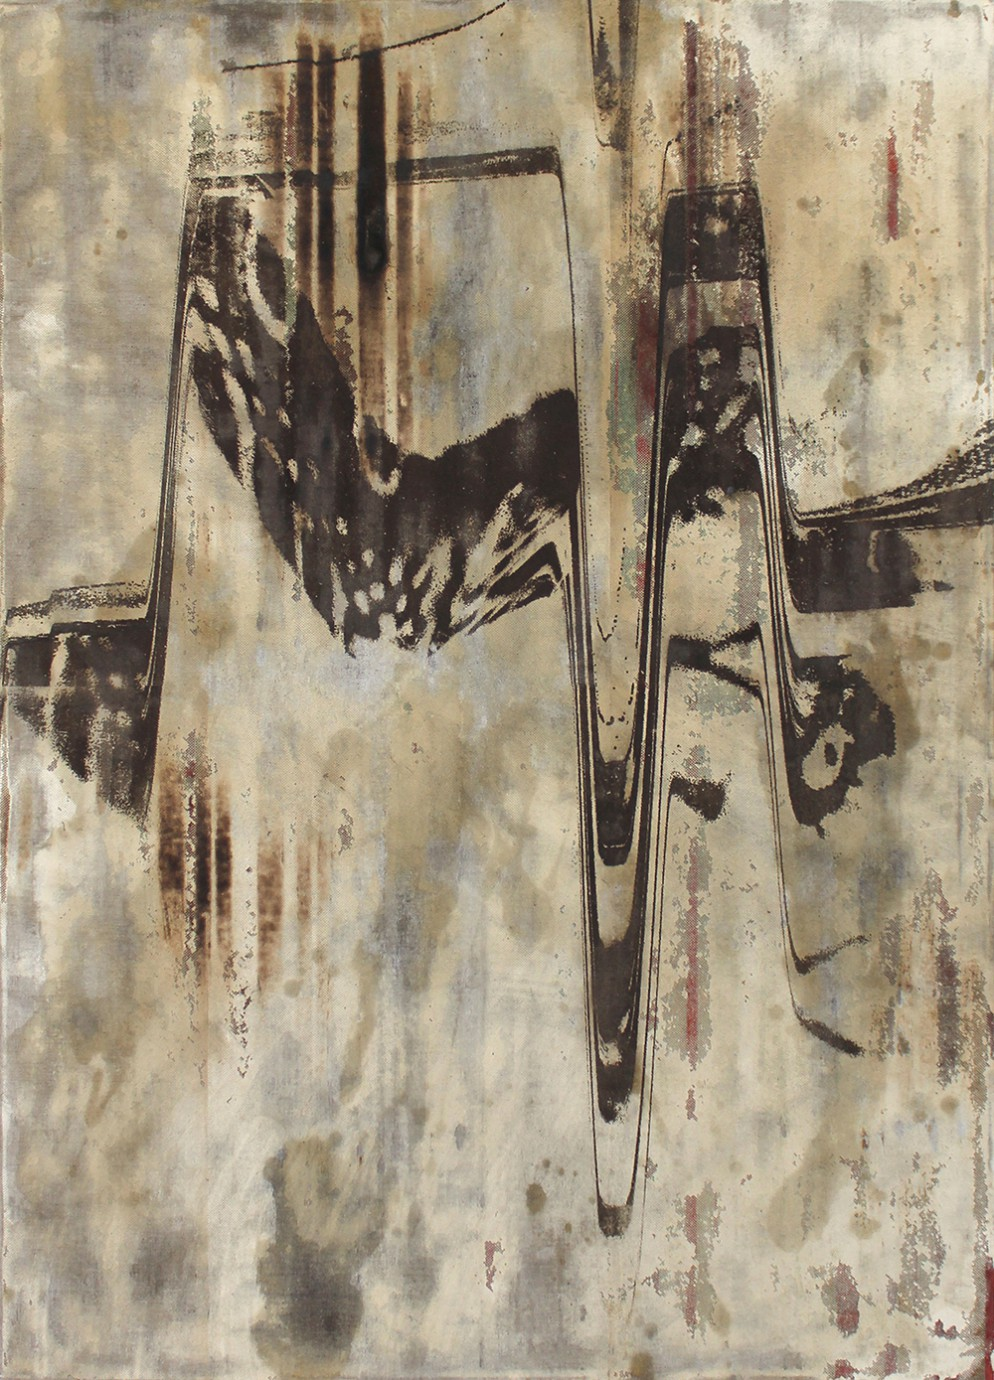 Renaud Regnery, Snake painting #4